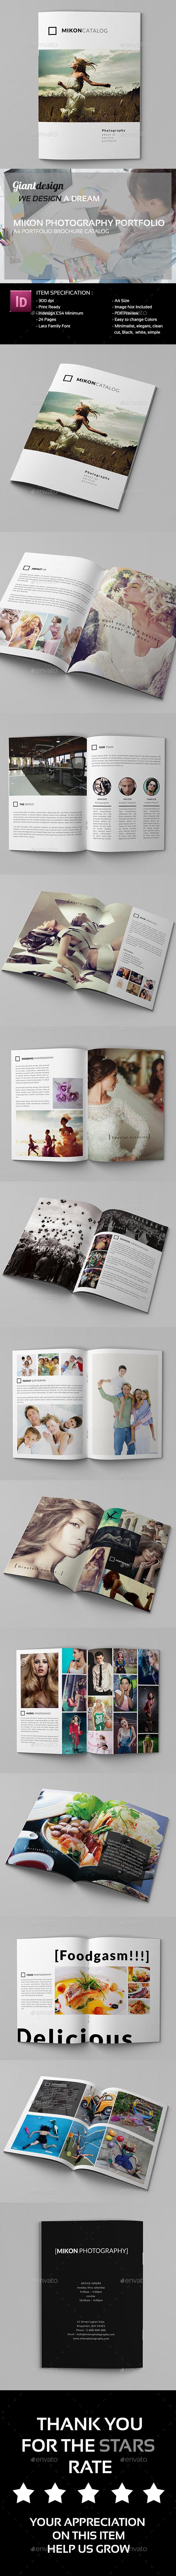 Mikon - Photography Portfolio A4 Catalog - Portfolio Brochures